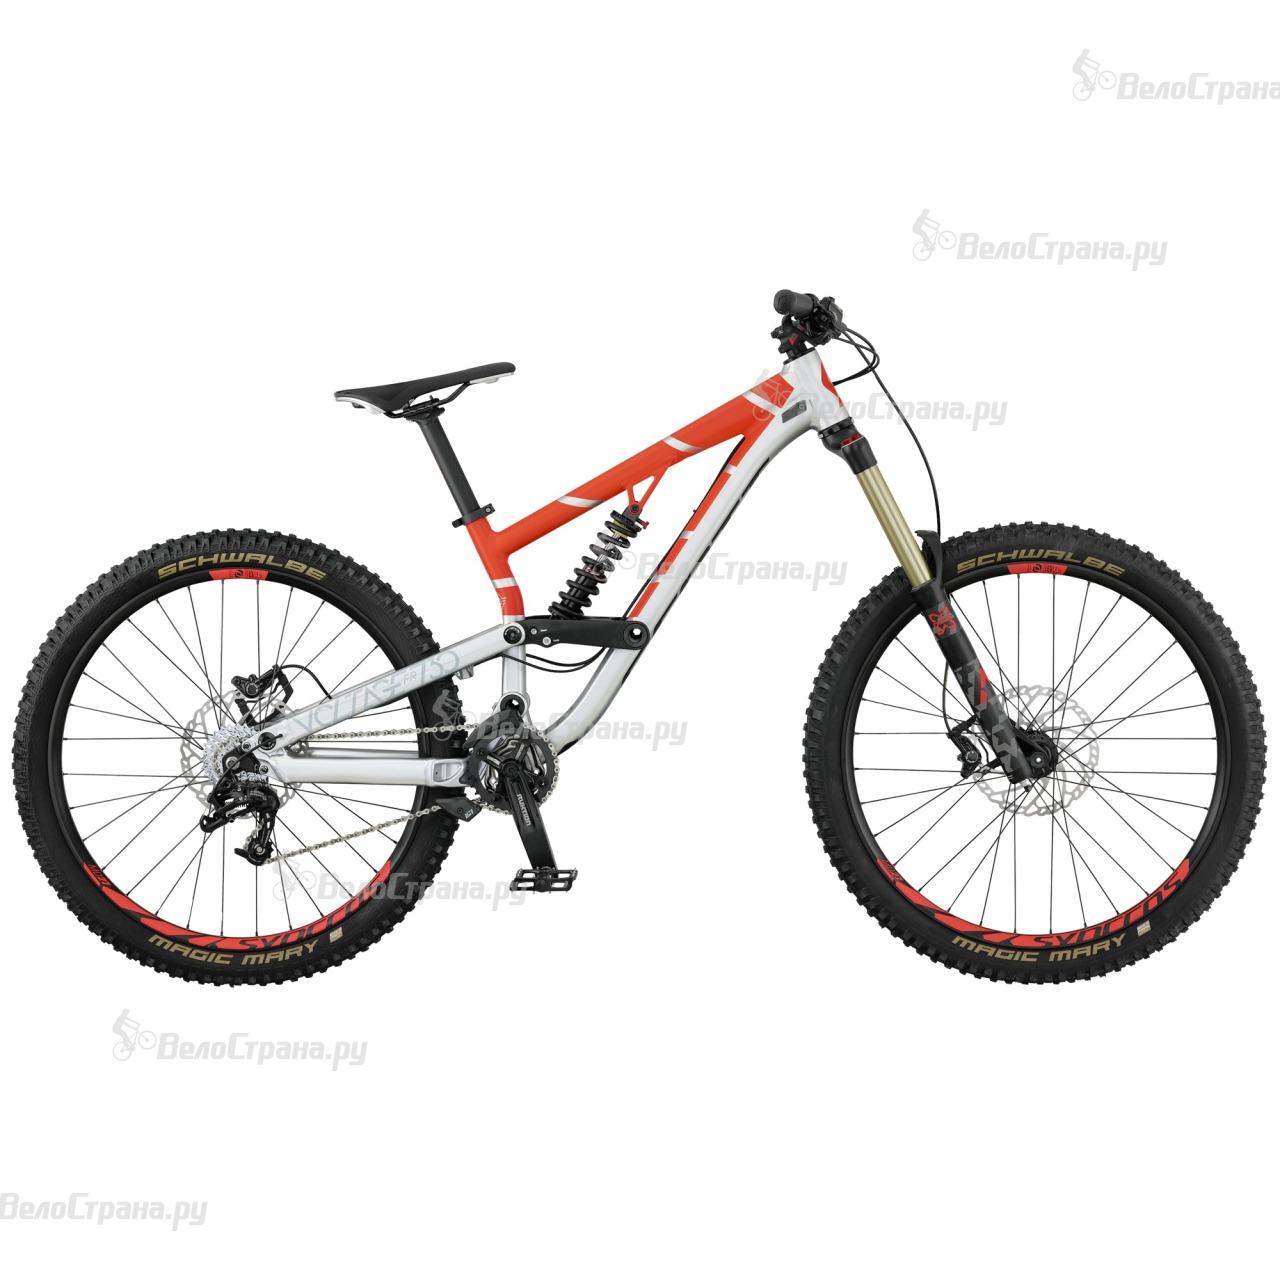 Велосипед Scott Voltage FR 730 (2017)